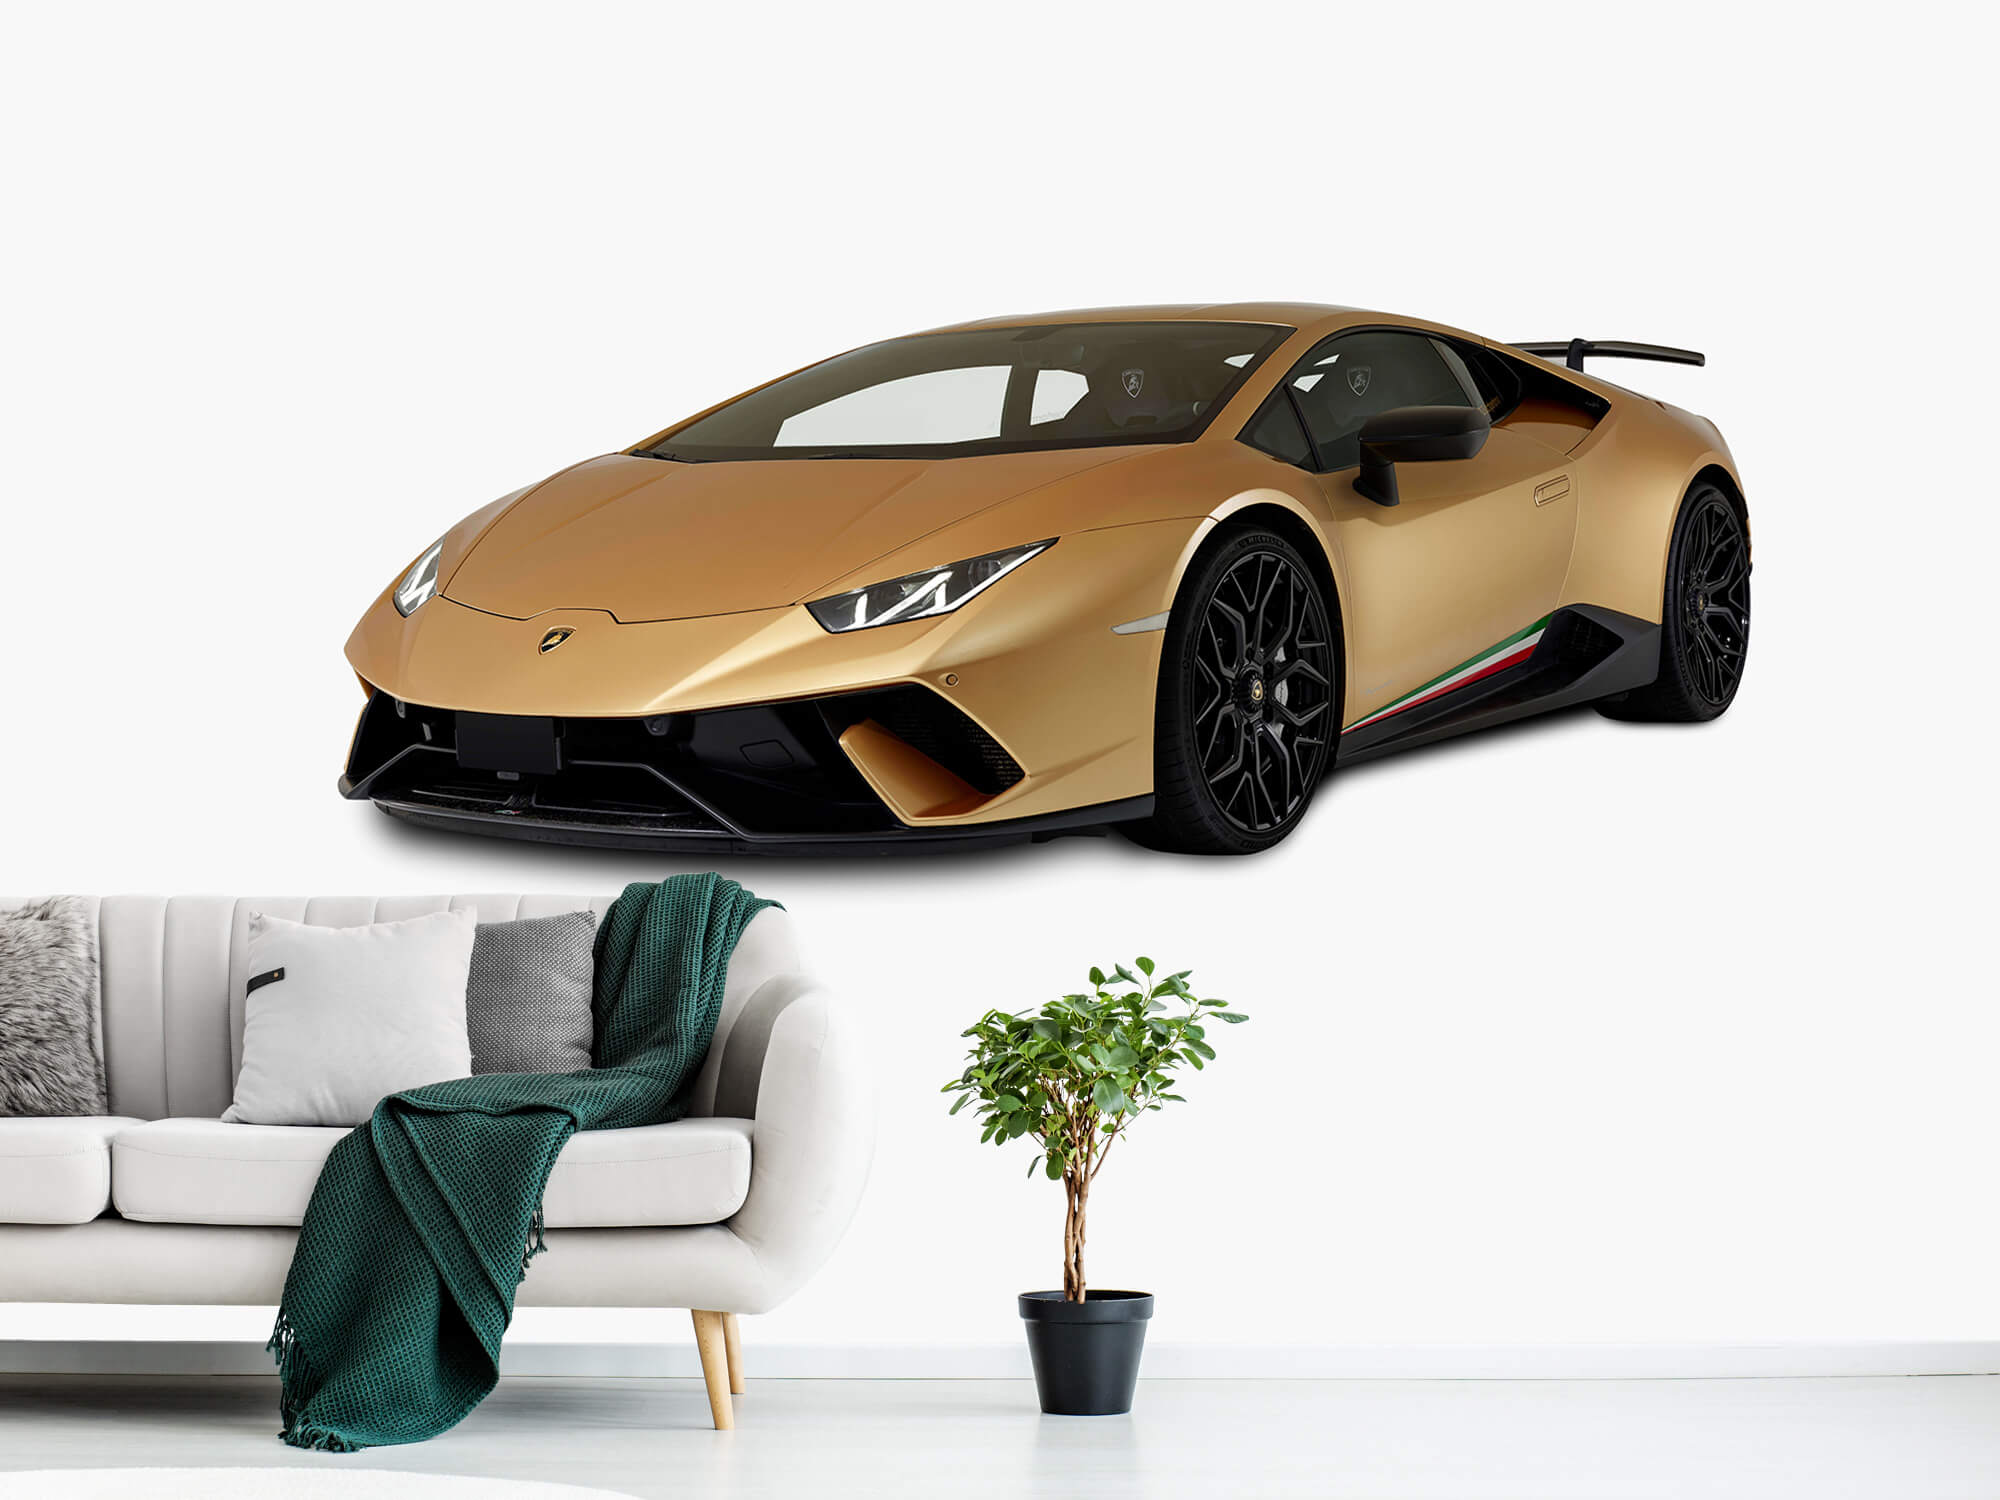 Wallpaper Lamborghini Huracán - Rechter voorkant wit 11